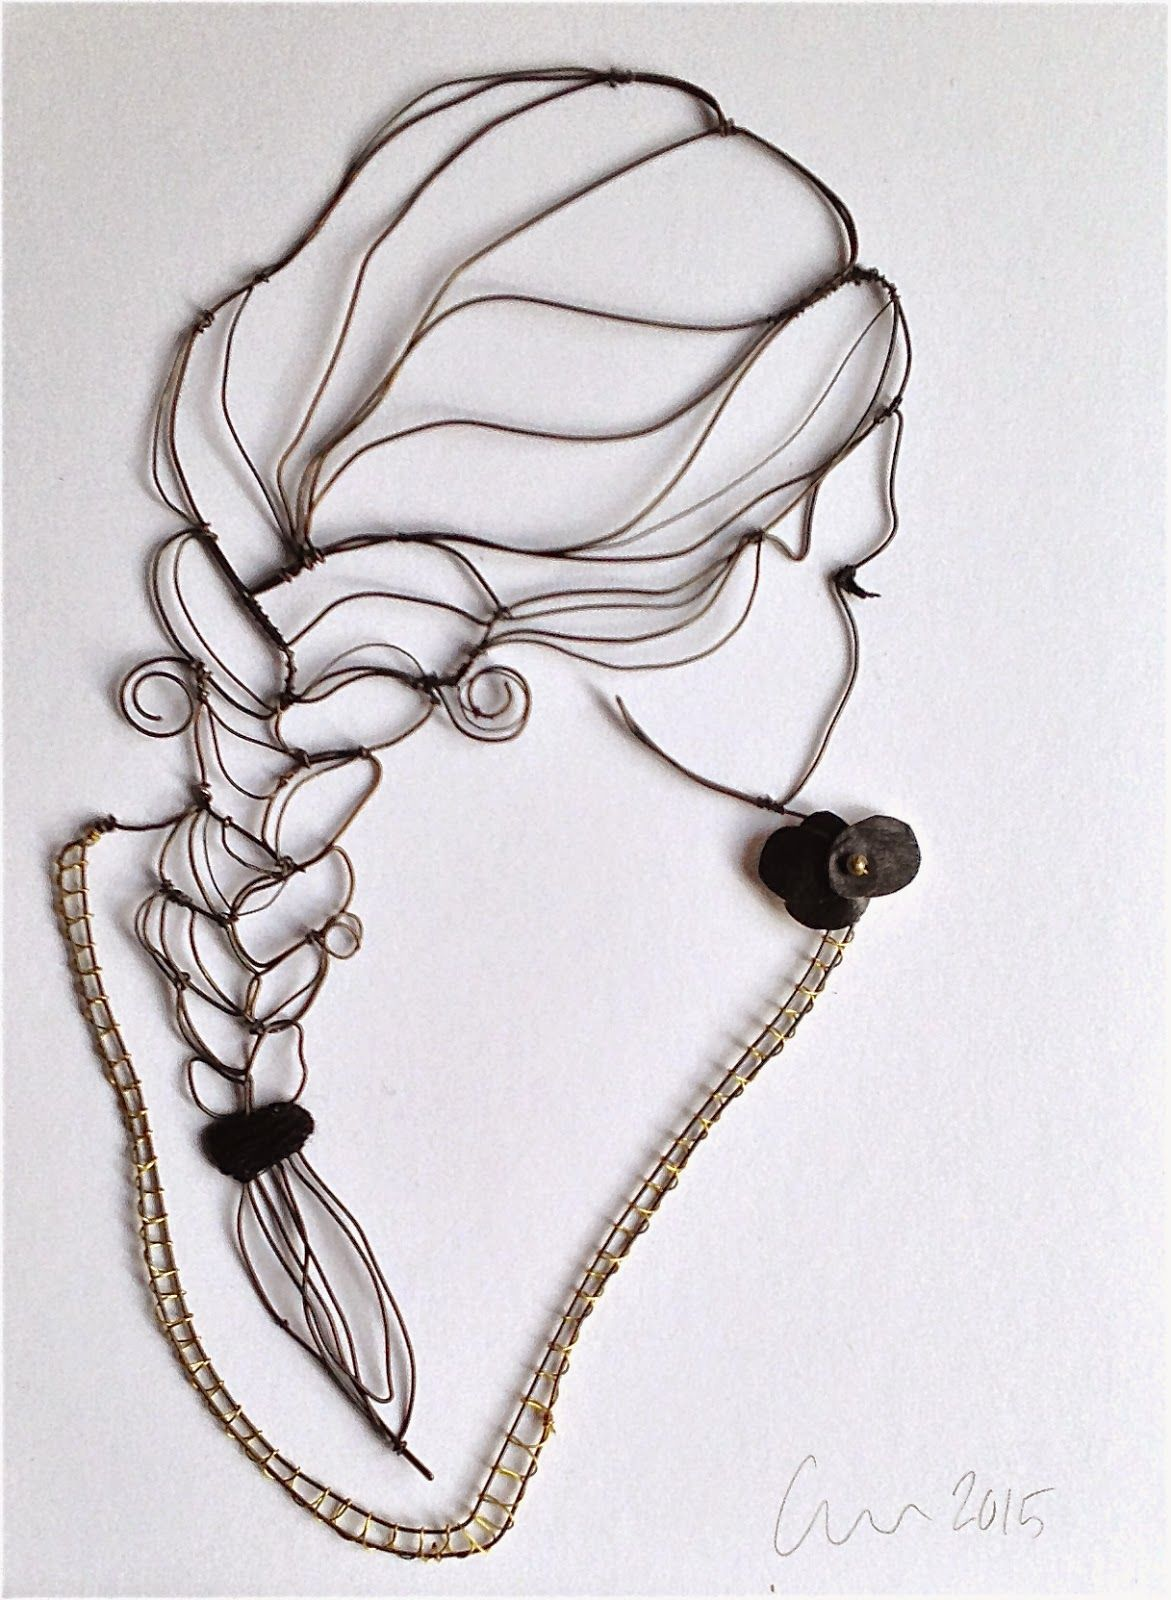 Wao una obra de arte!!!.- Magaly12323 | Wire | Pinterest | Draht ...